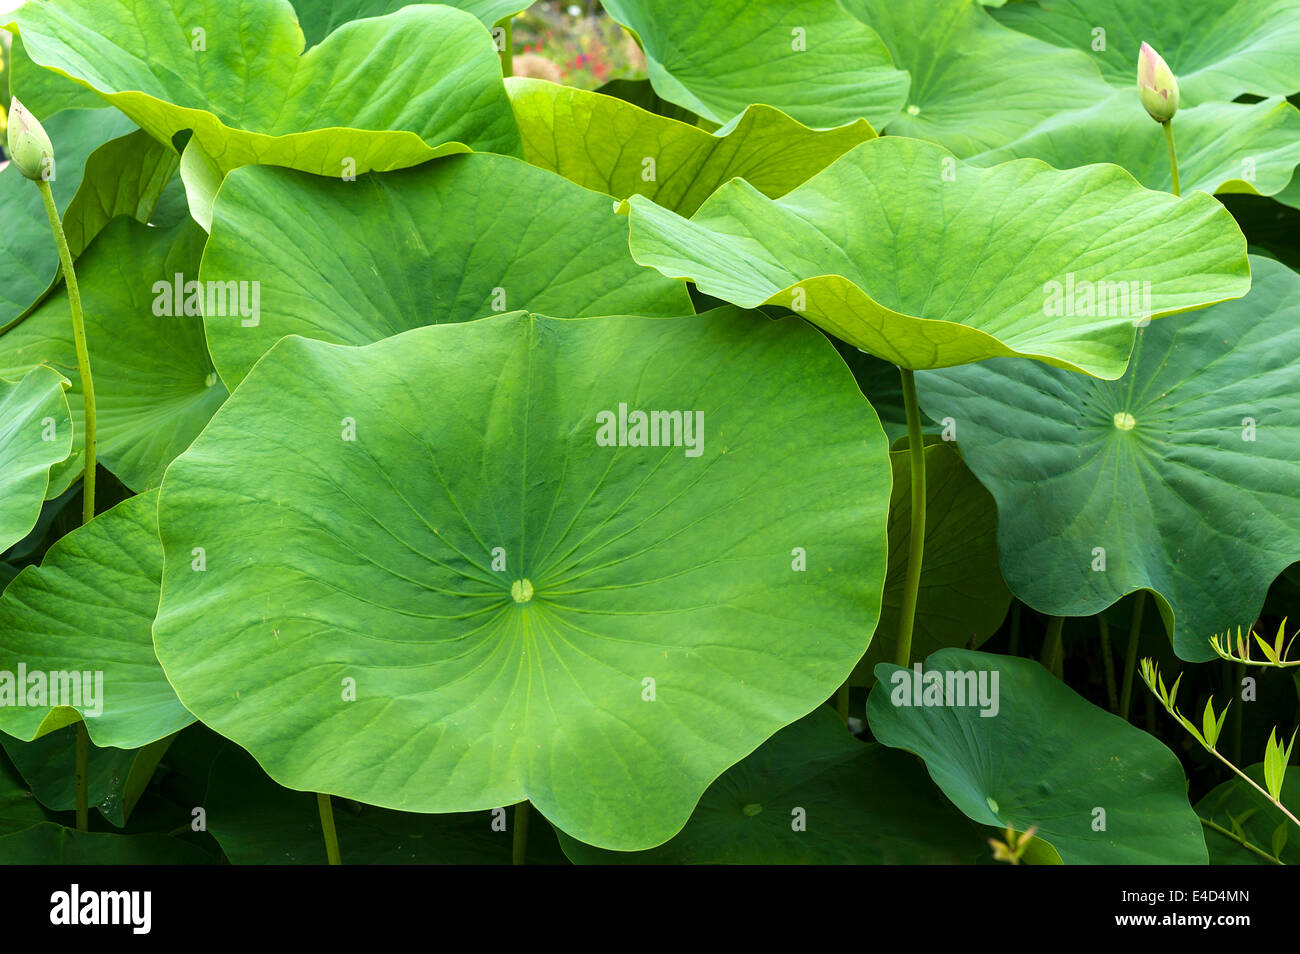 Lotus Flower Leaves Stock Photos Lotus Flower Leaves Stock Images